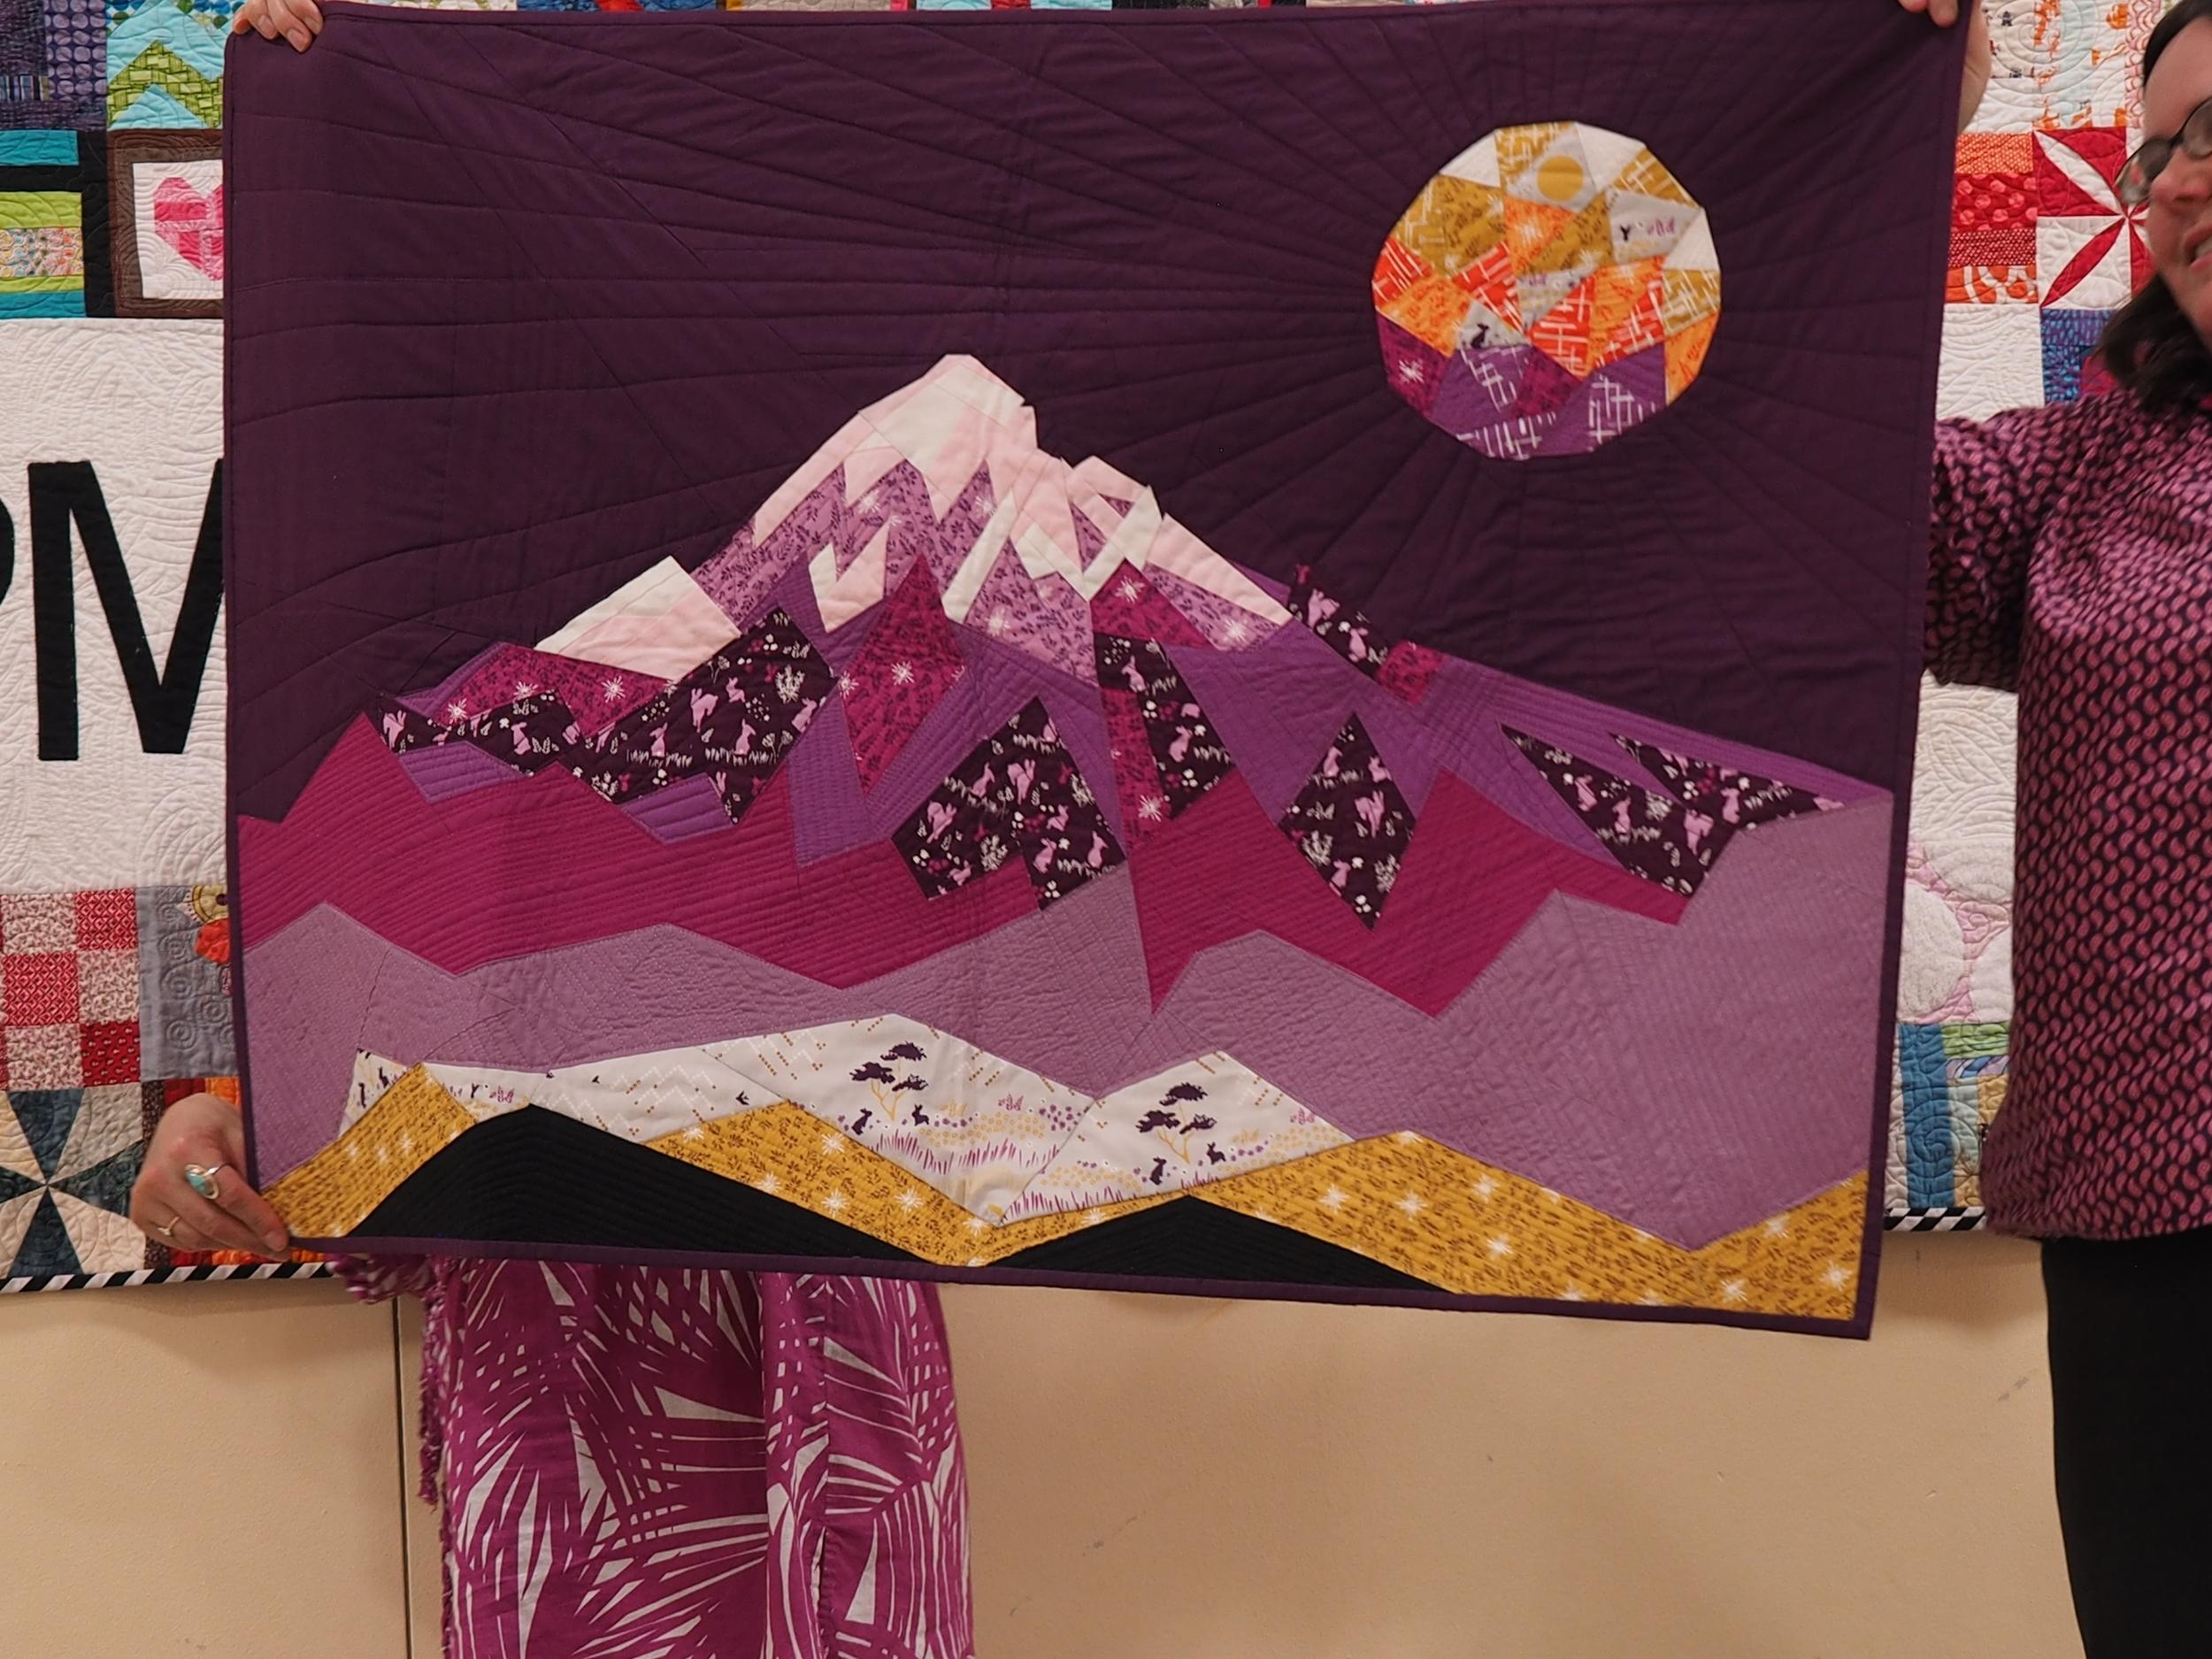 Violet Craft  Mt. Hood  @violetcraft